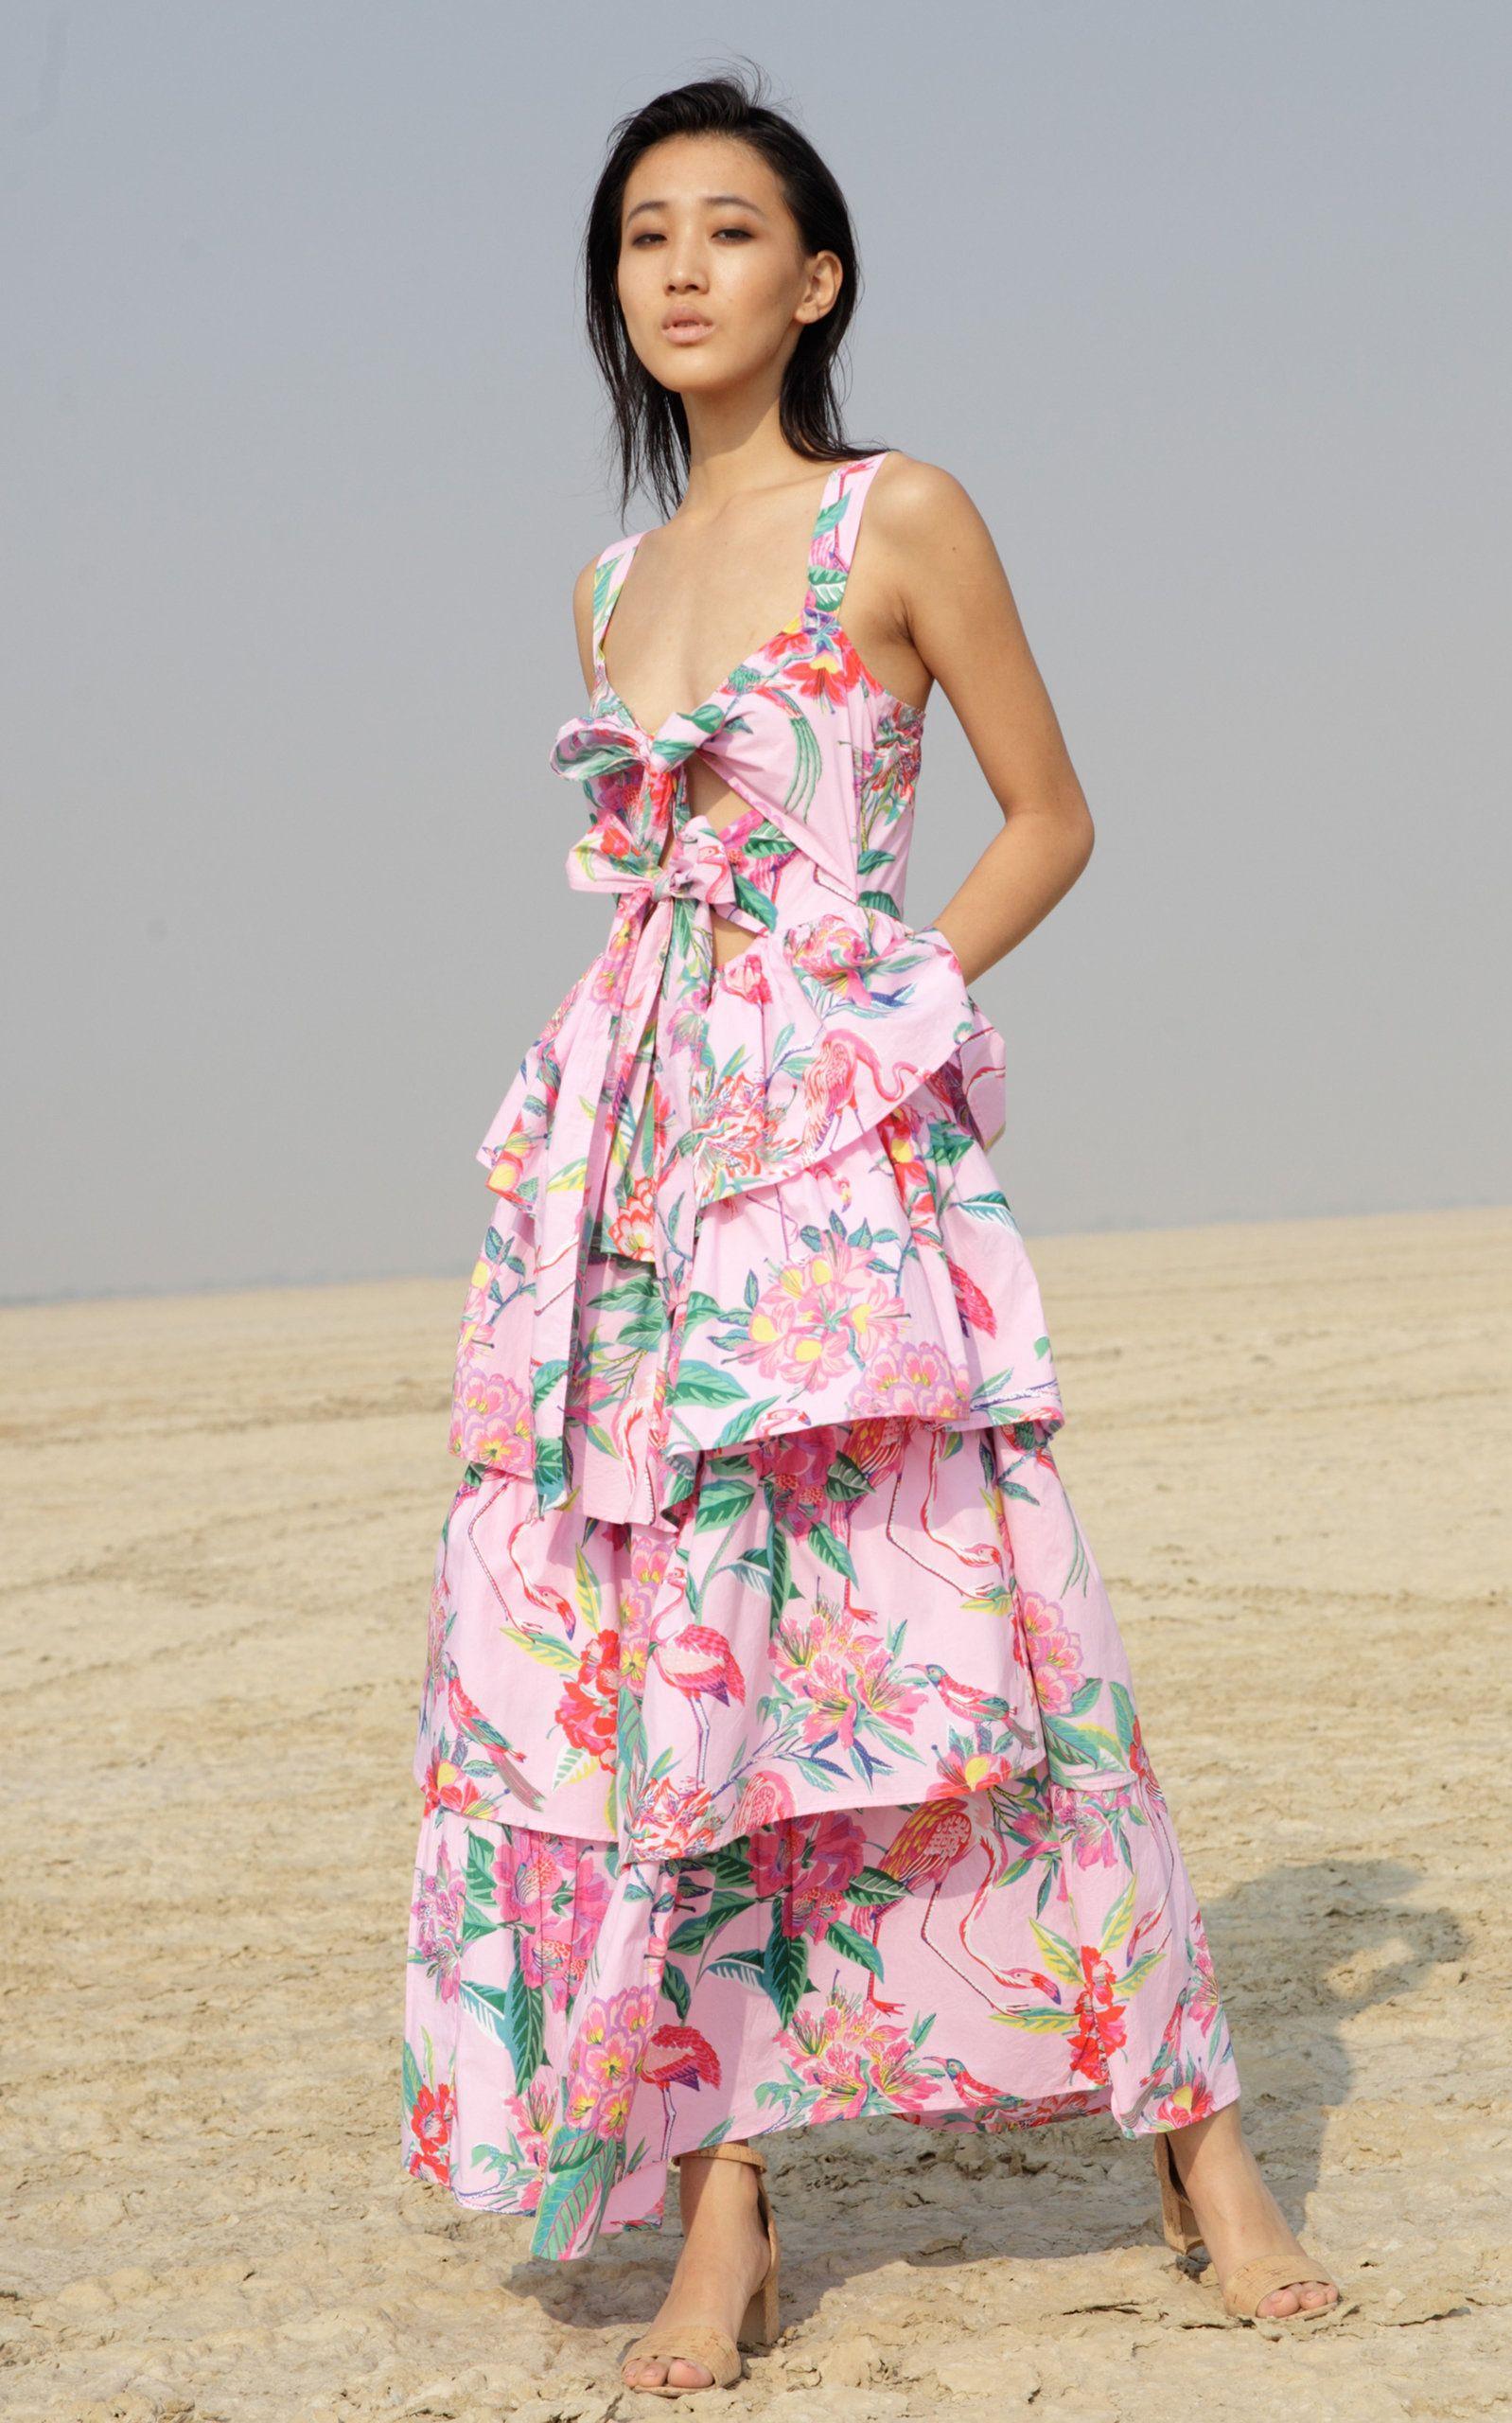 b41a6fbc008 Banjanan Aster Cotton Poplin Dress in 2019 | Playing Dress-Up ...